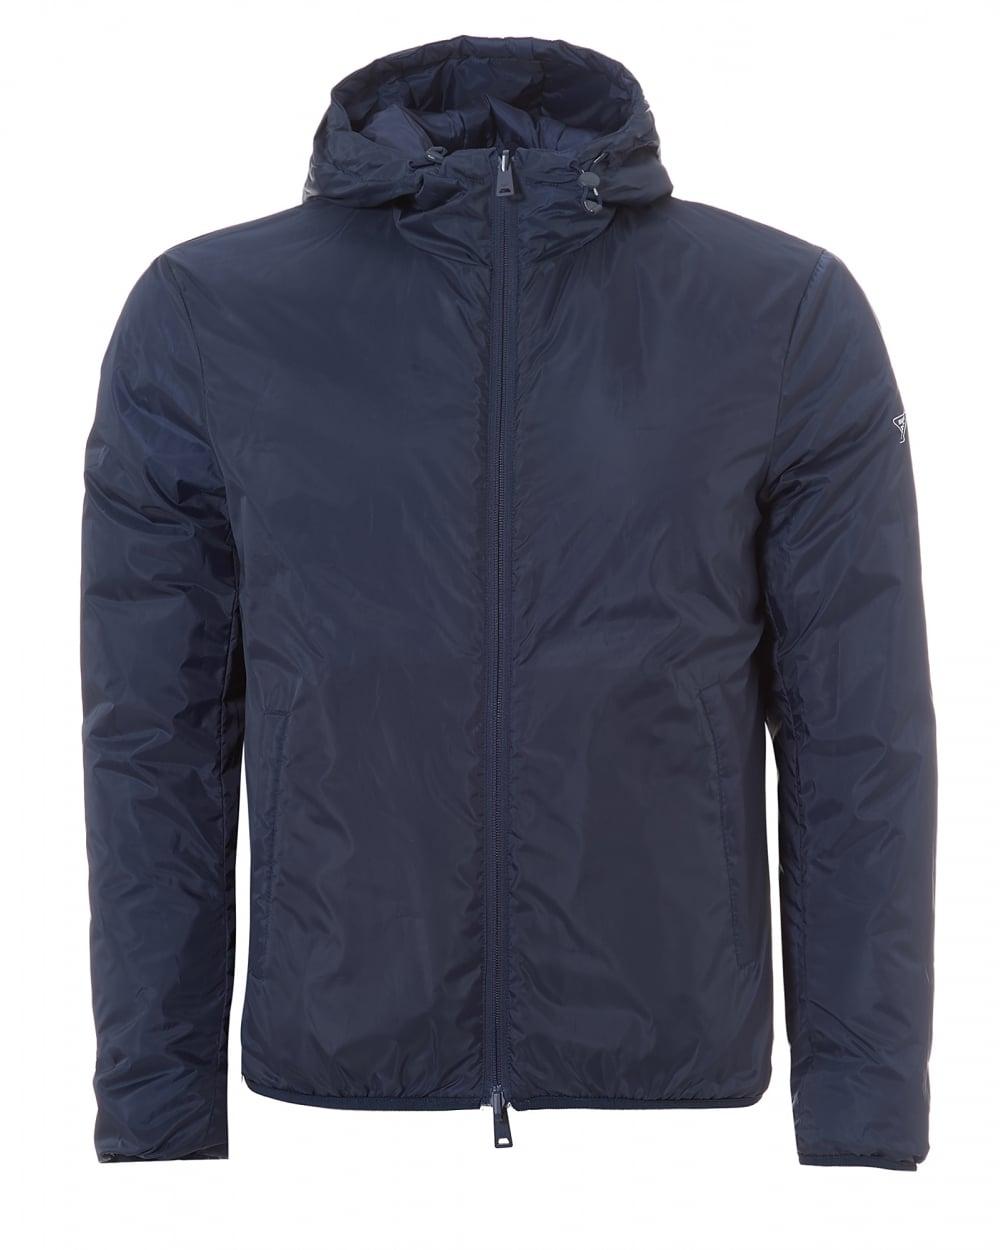 Mens Blue Jacket Jackets Review